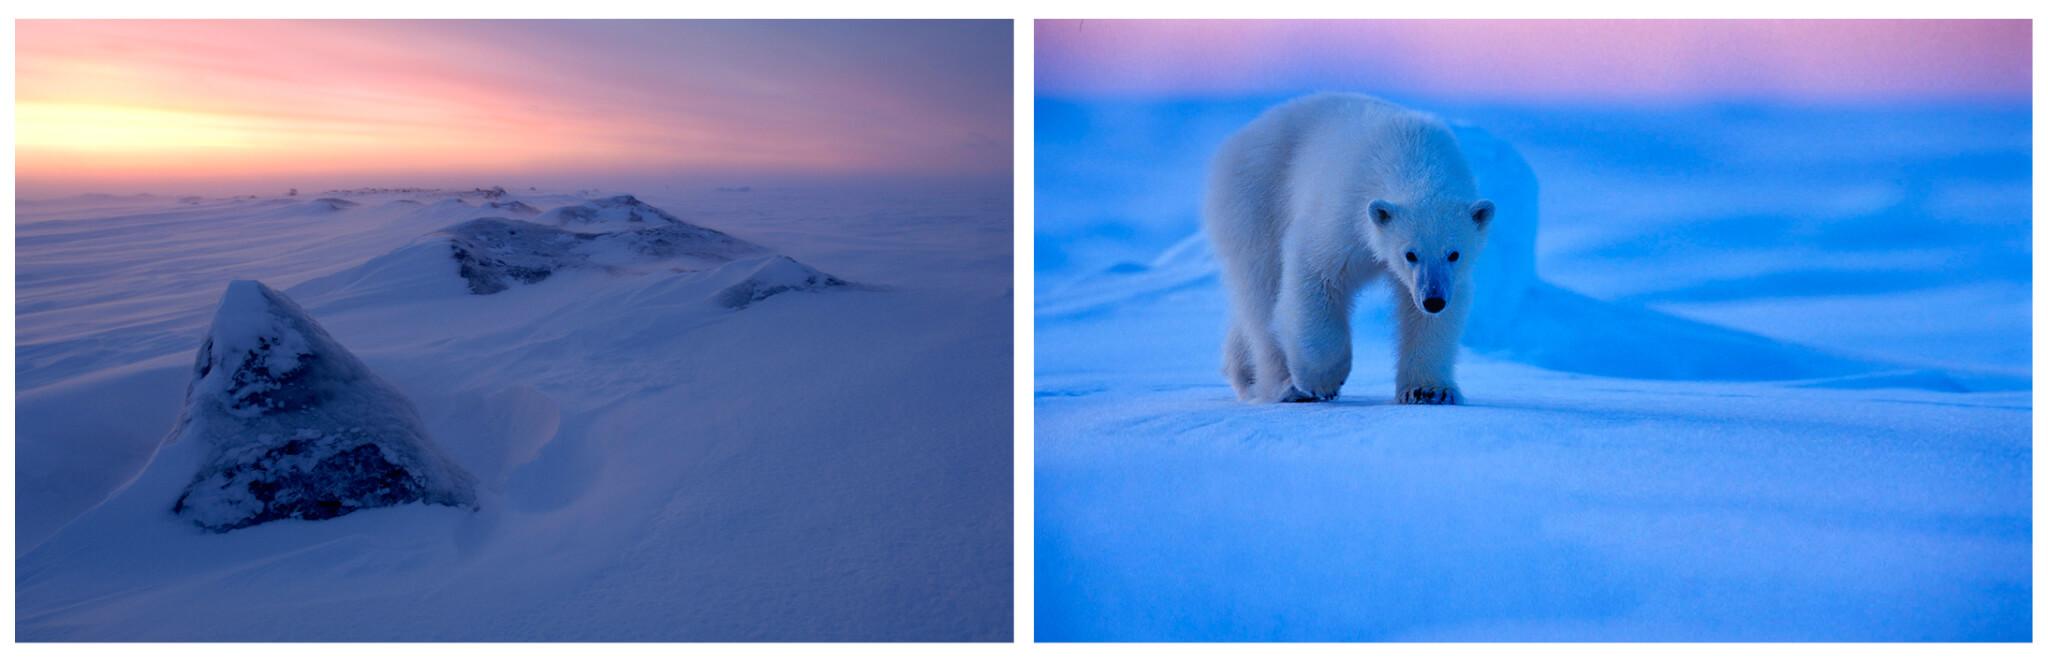 Polar bears at Svalbard